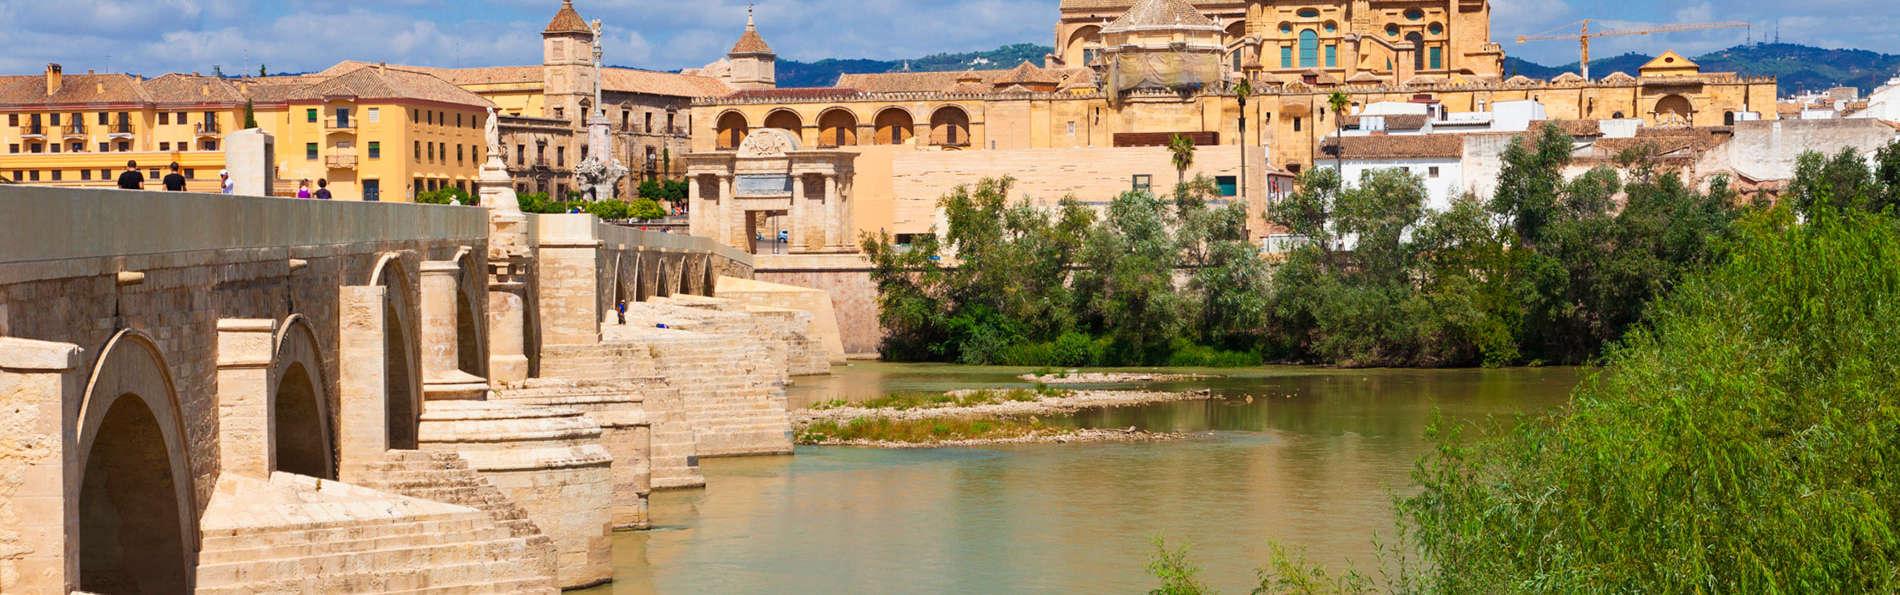 Hospes Palacio del Bailío - EDIT_cordoba.jpg